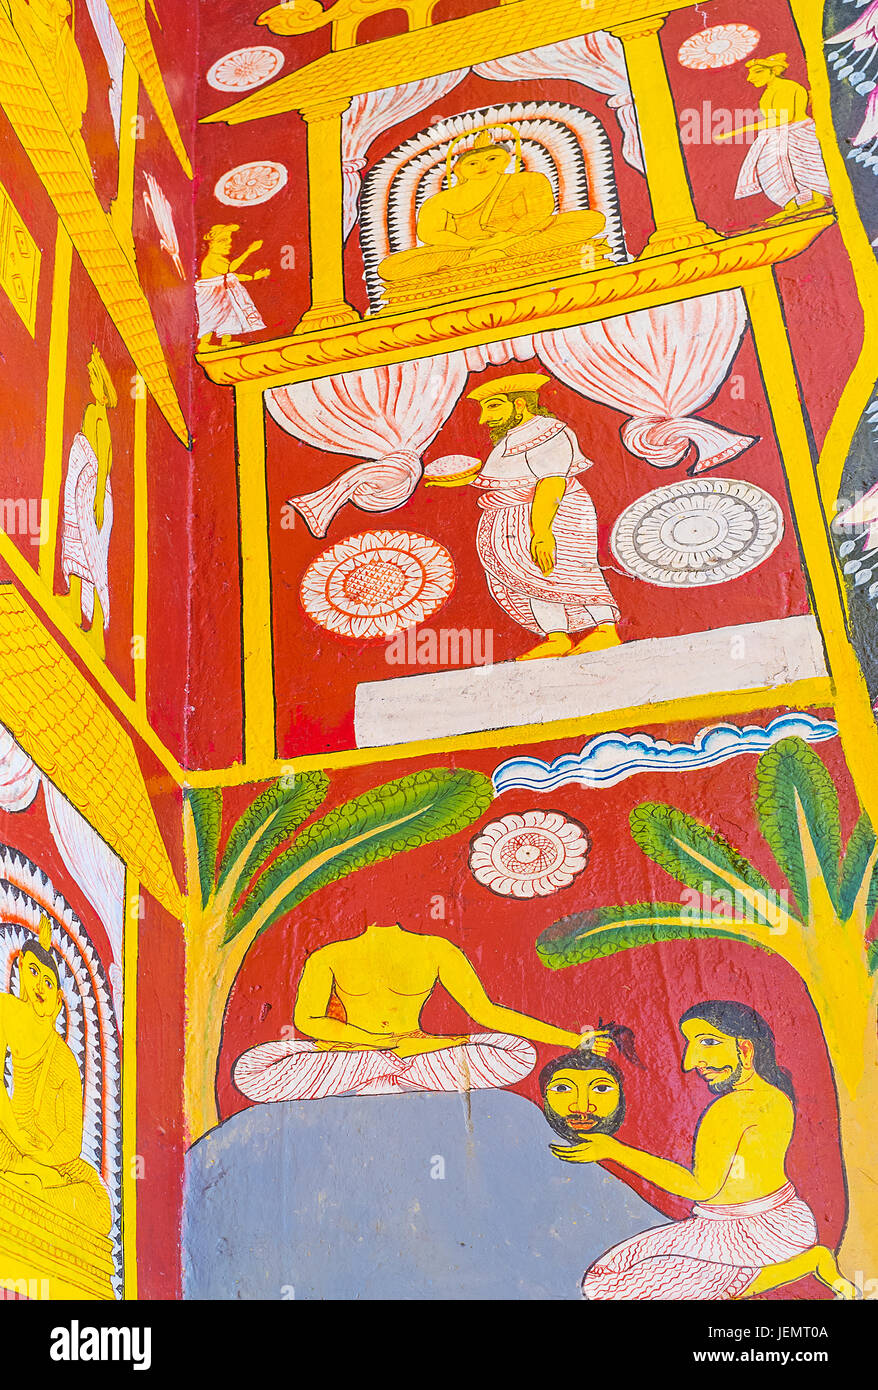 PAMUNUWA, SRI LANKA - NOVEMBER 29, 2016: The pictures on wall of Pamunuwa Buddhist Temple made in naive style, on - Stock Image